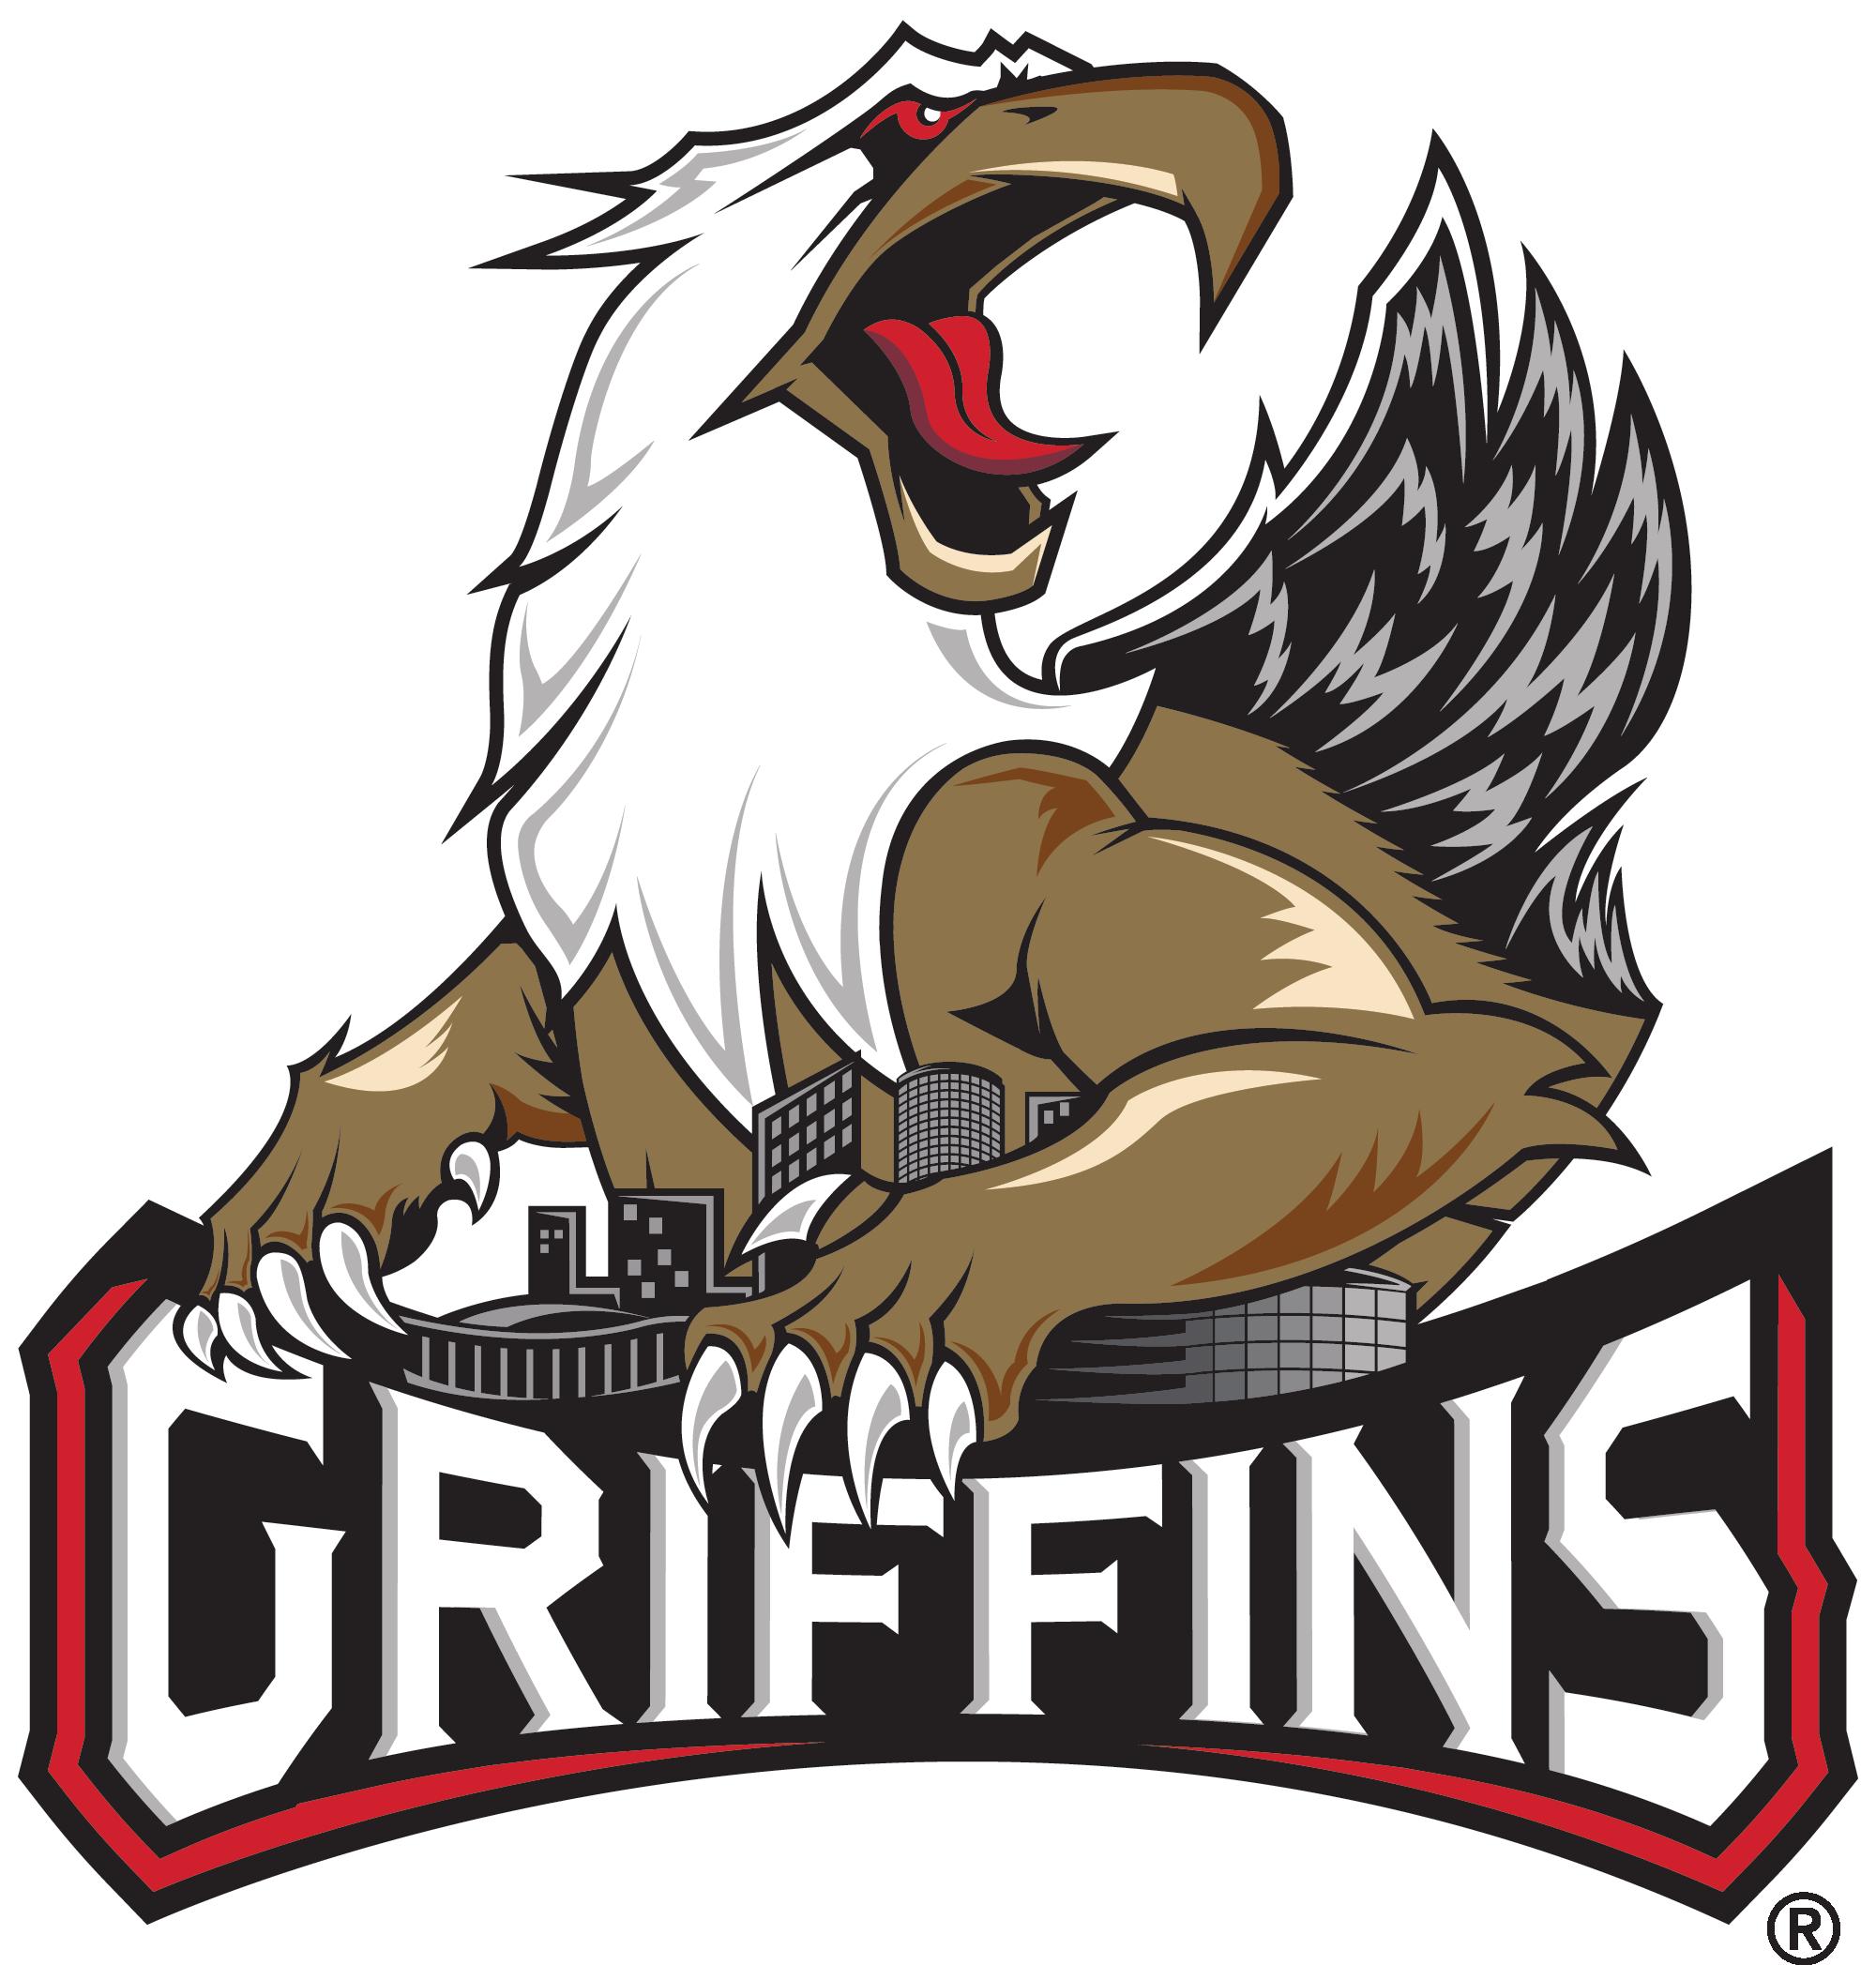 Griffins goaltender jared coreau. Hockey clipart goalie pad